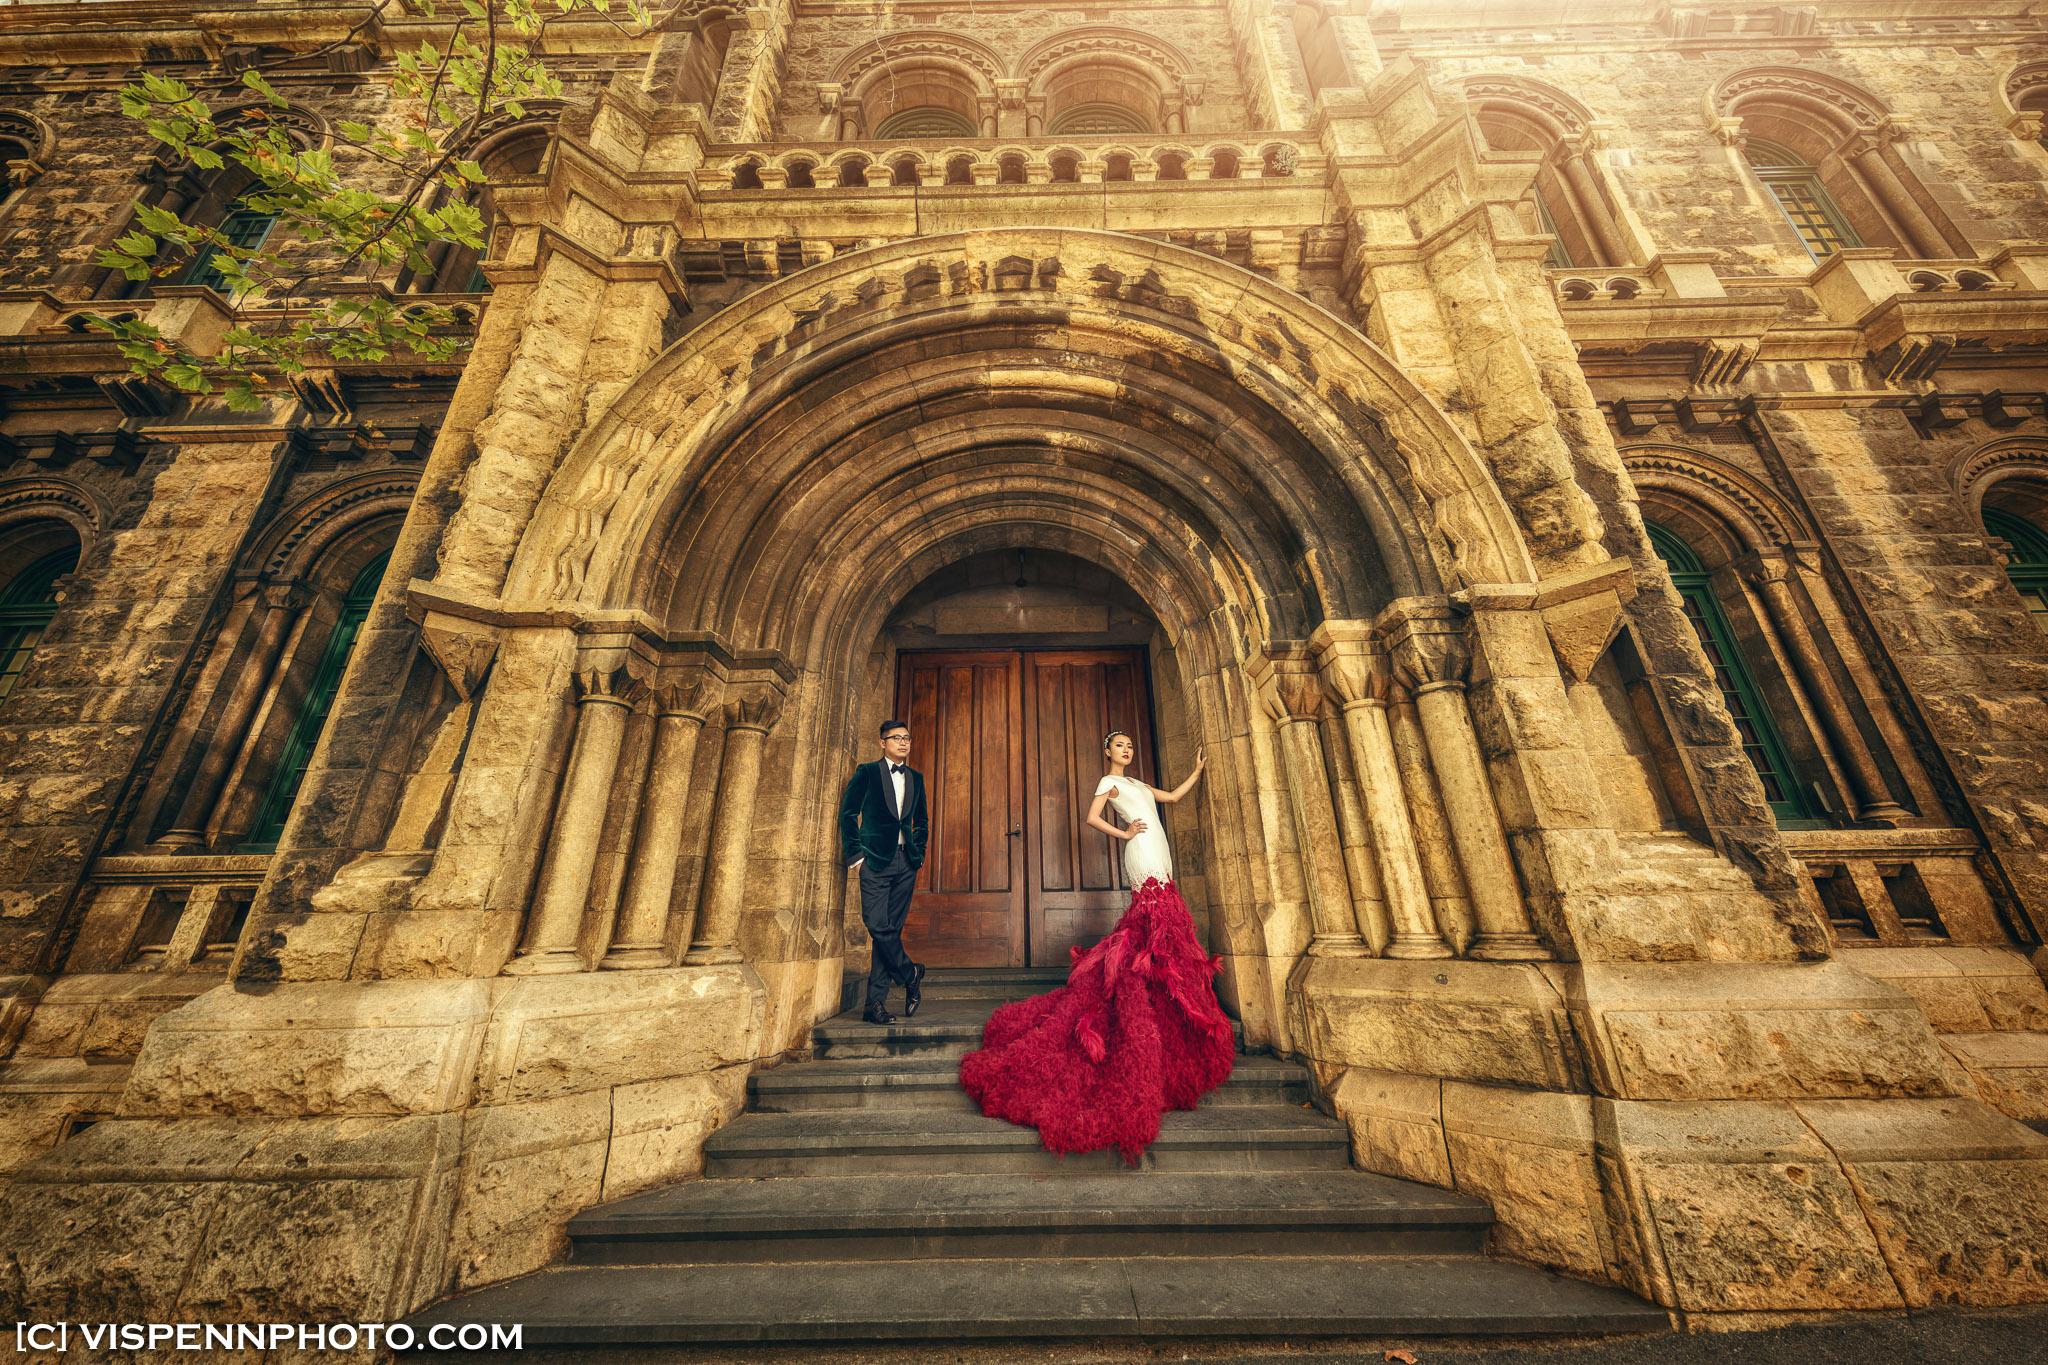 PRE WEDDING Photography Melbourne ZHPENN StacieYi PreWedding 5993 1